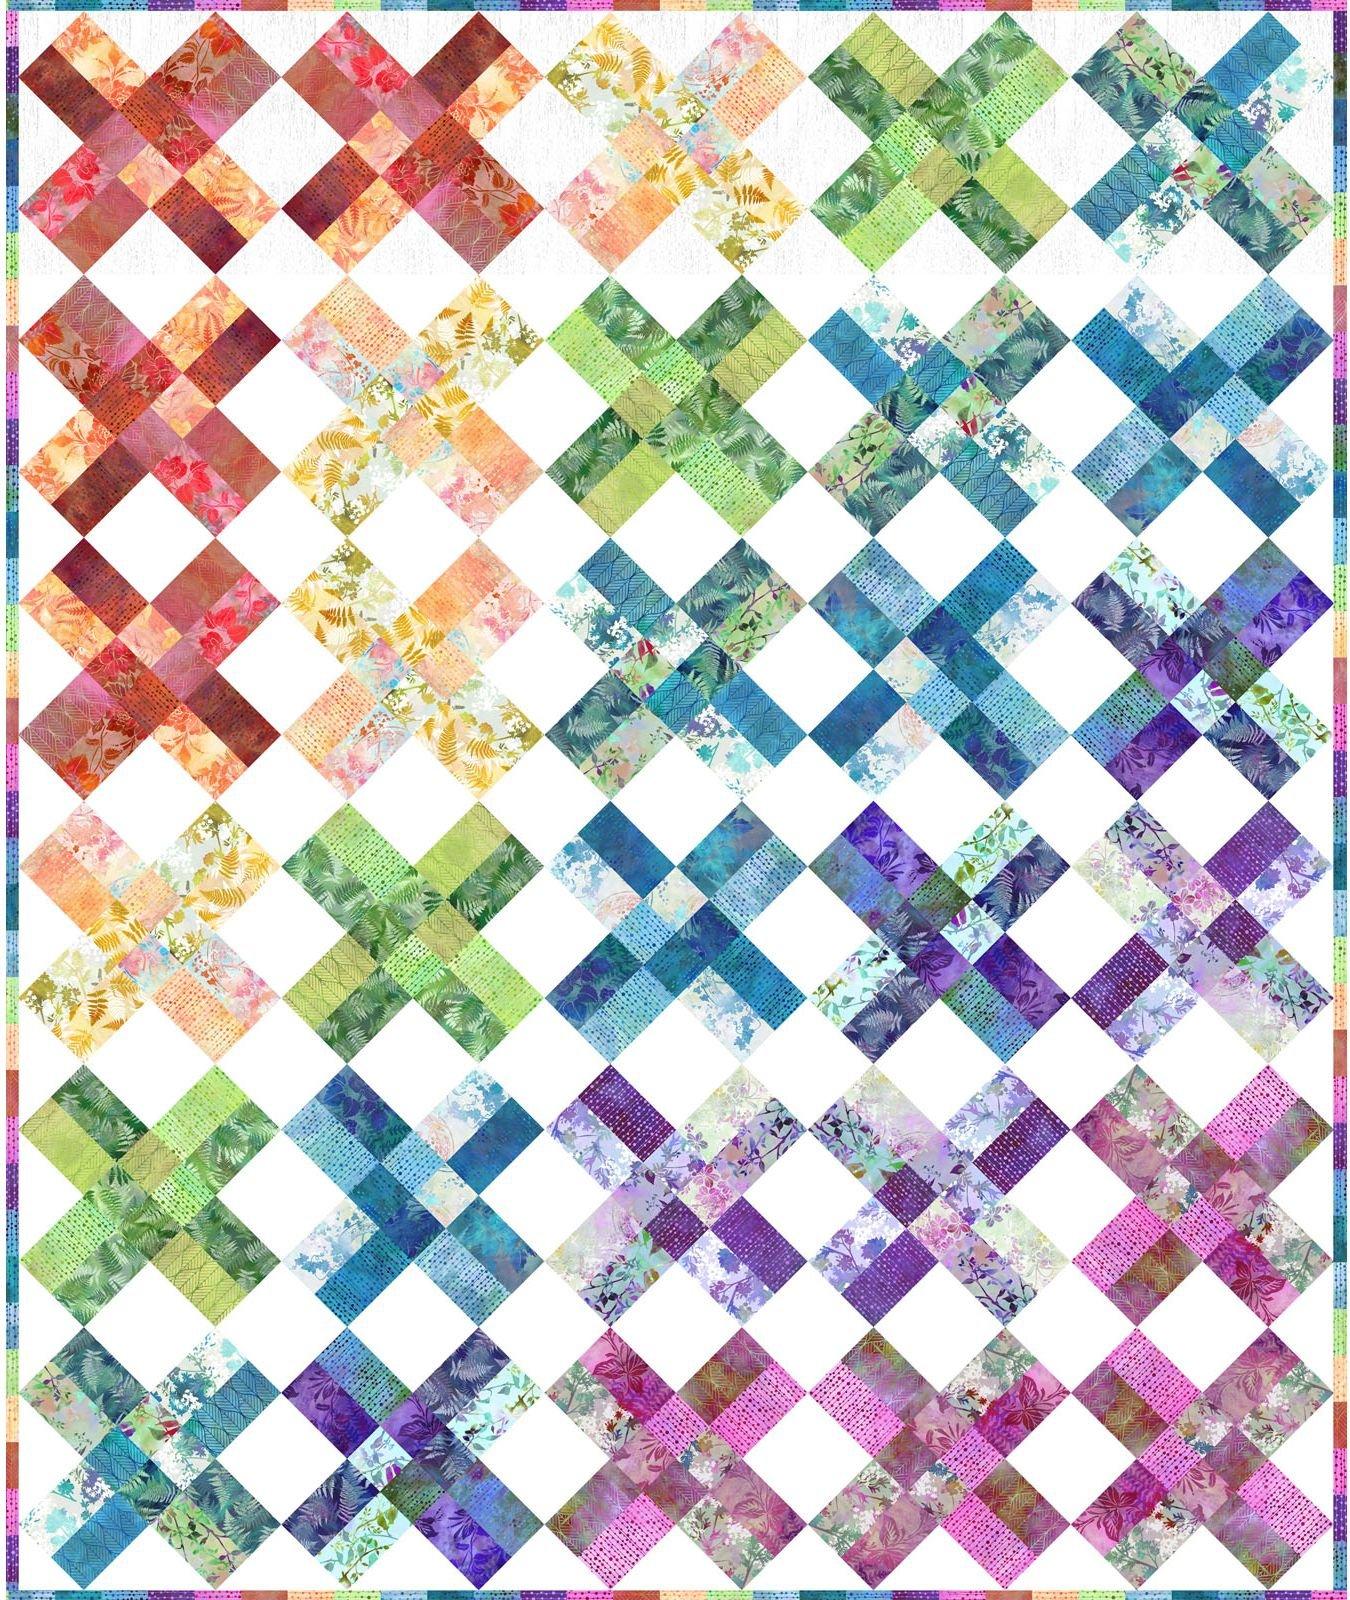 In The Beginning - Garden of Dreams by Jason Yenter - Garden Treasures Quilt KIT!